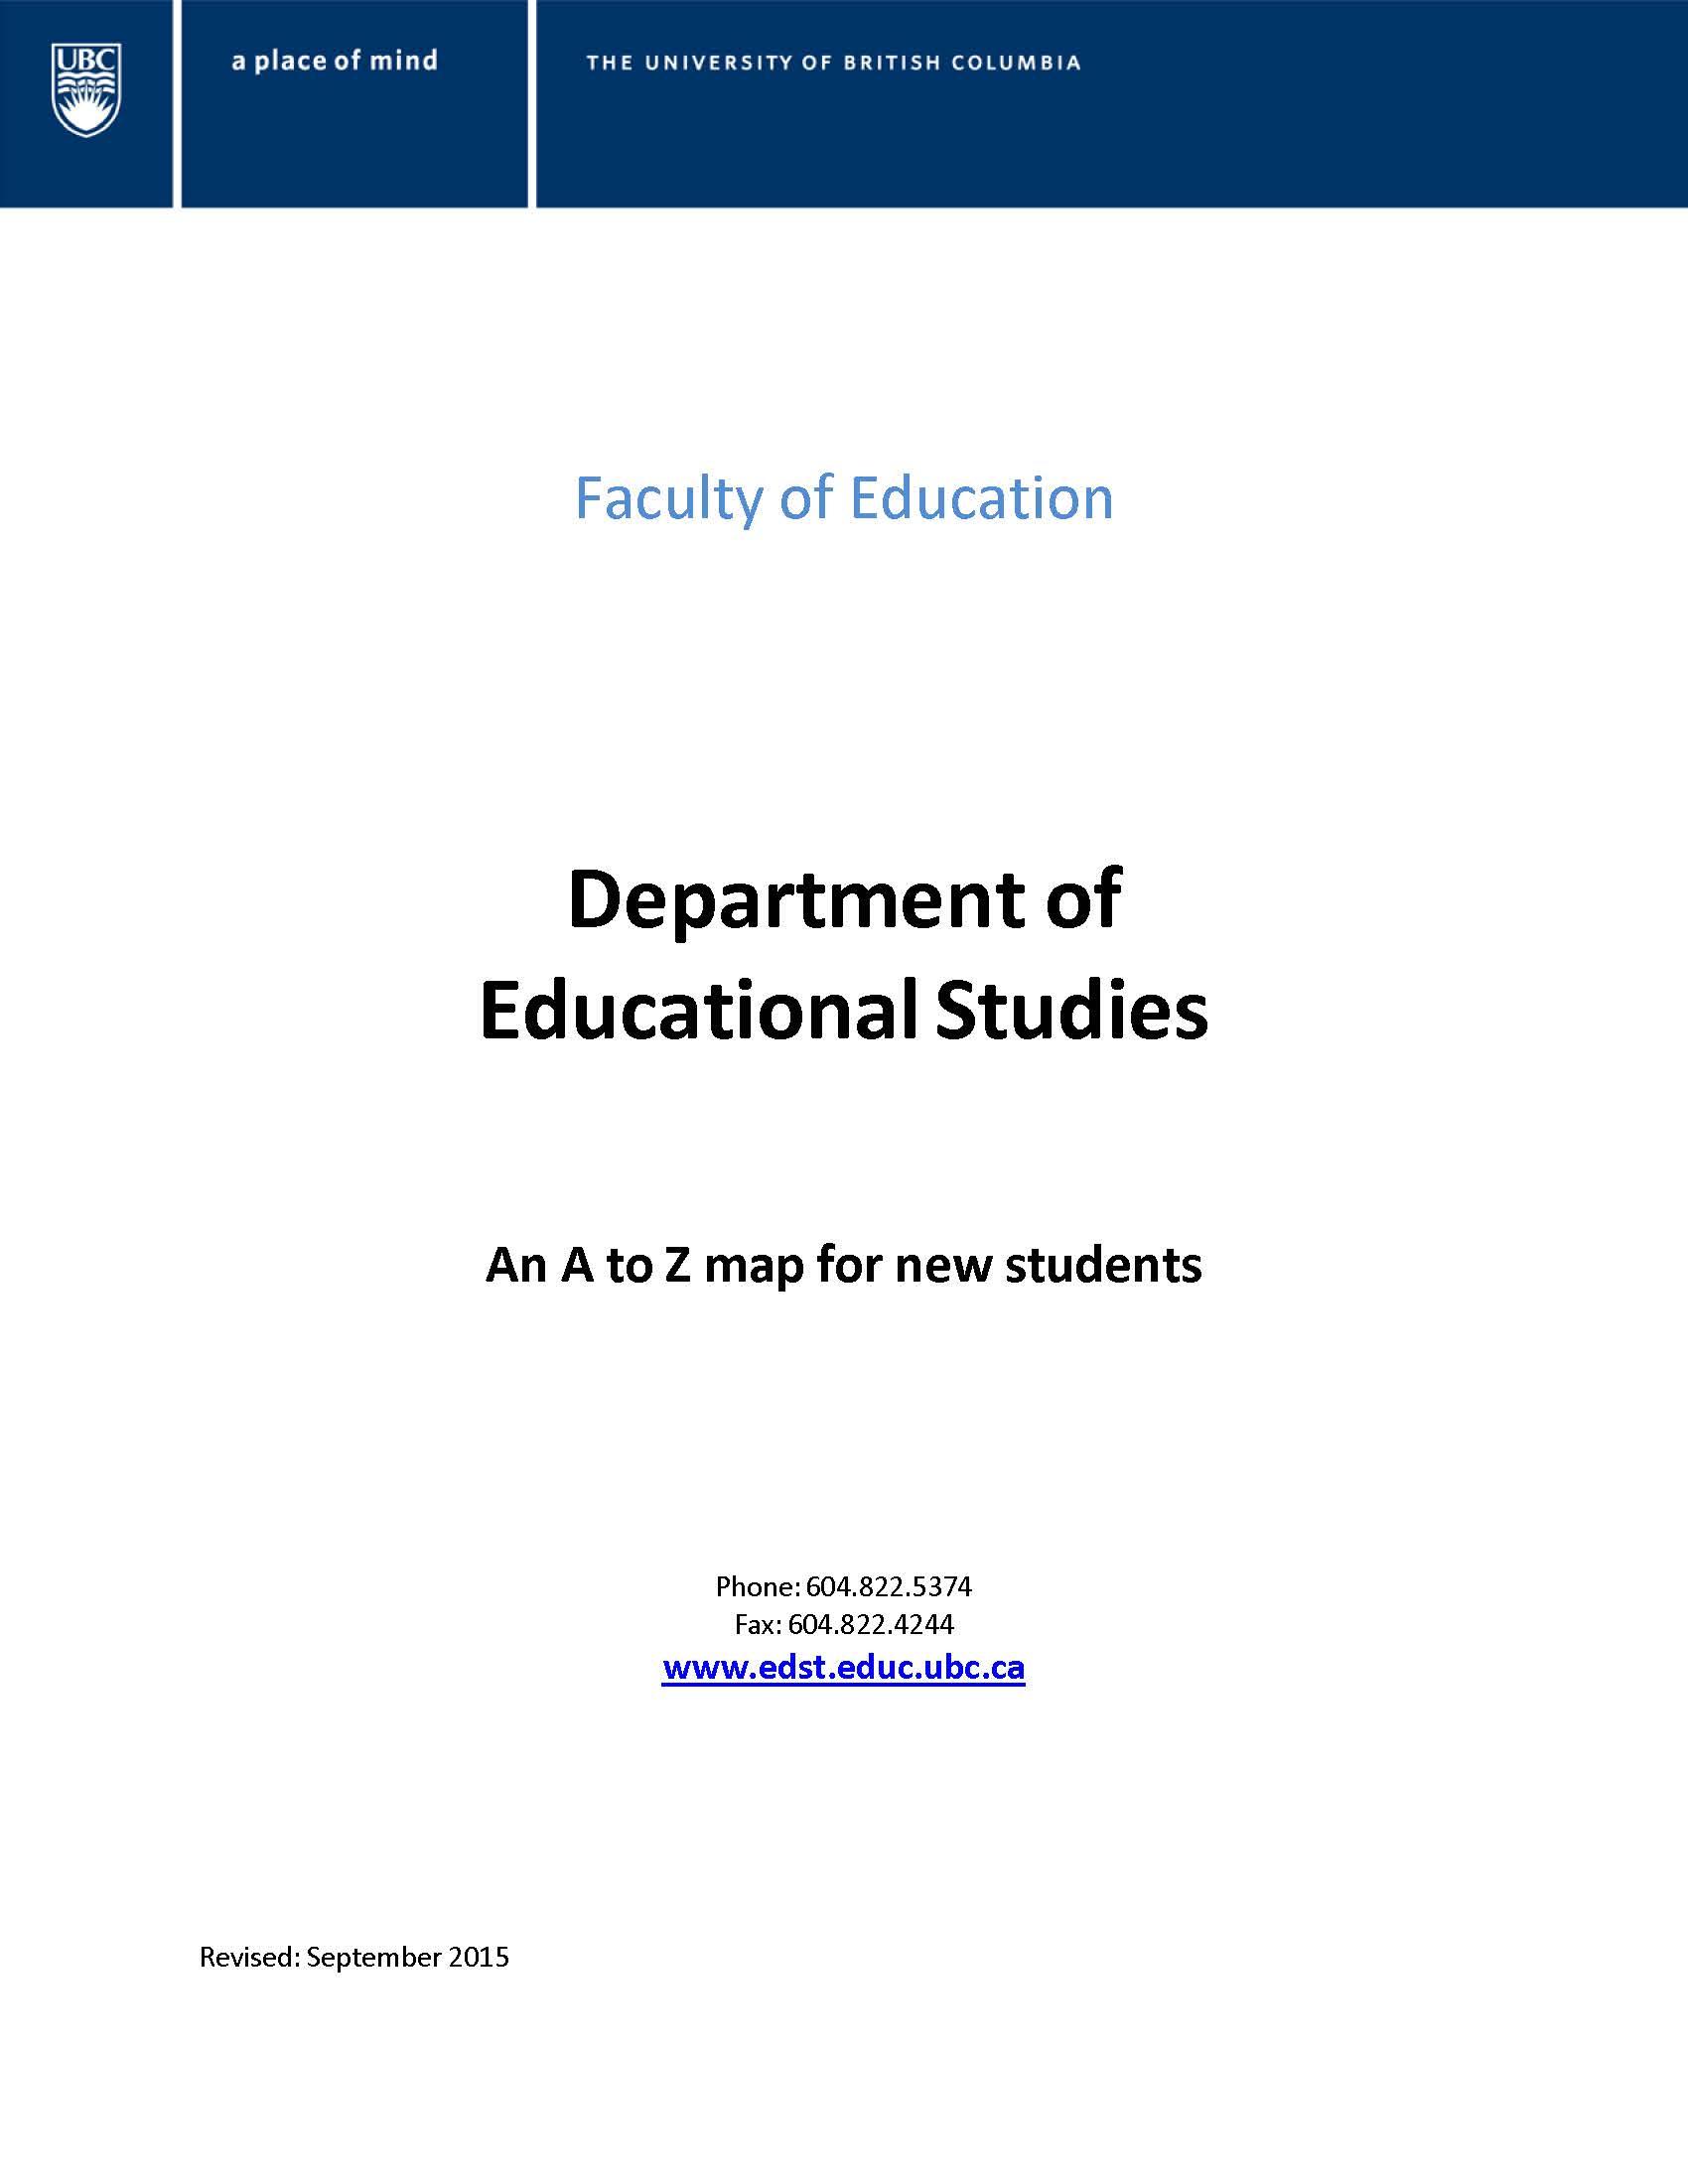 EDST-New-Student-Handbook-Sept 2015_Page_01